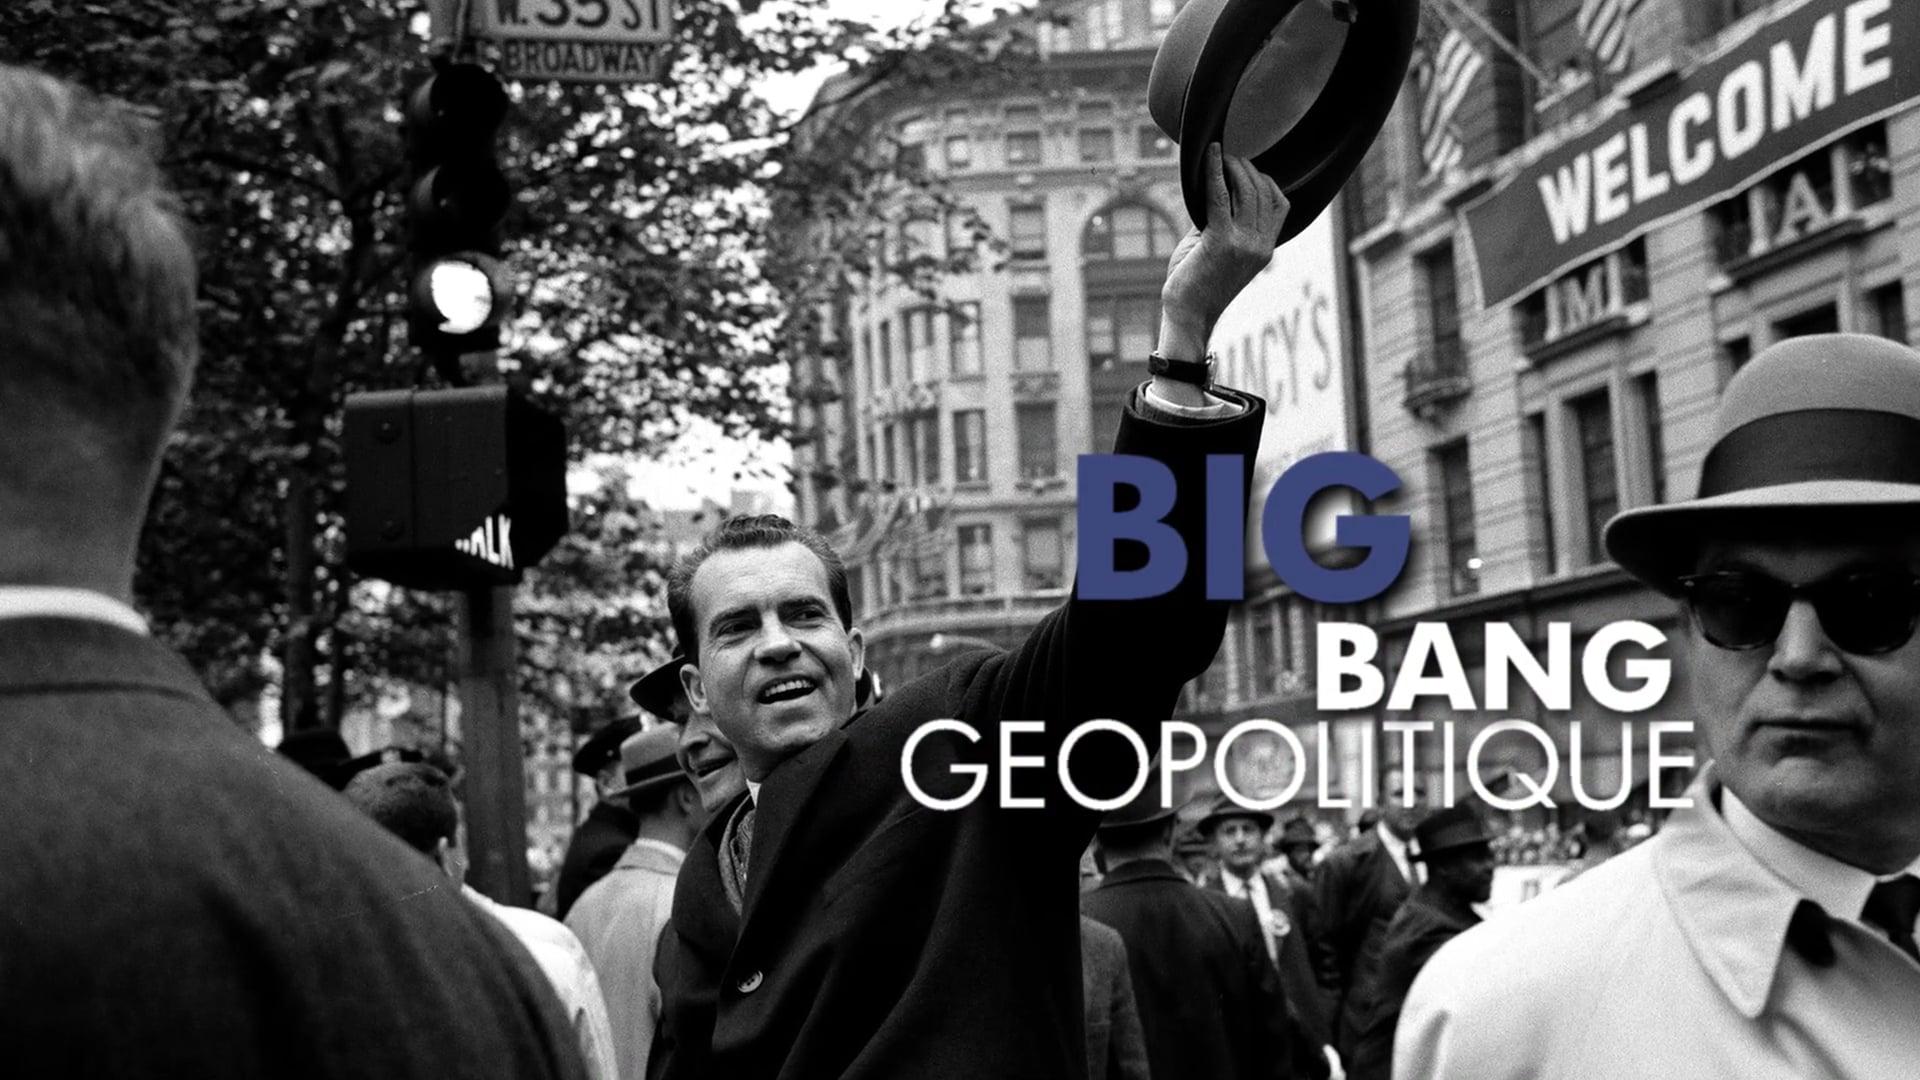 GEOPOLITICAL BIG BANG